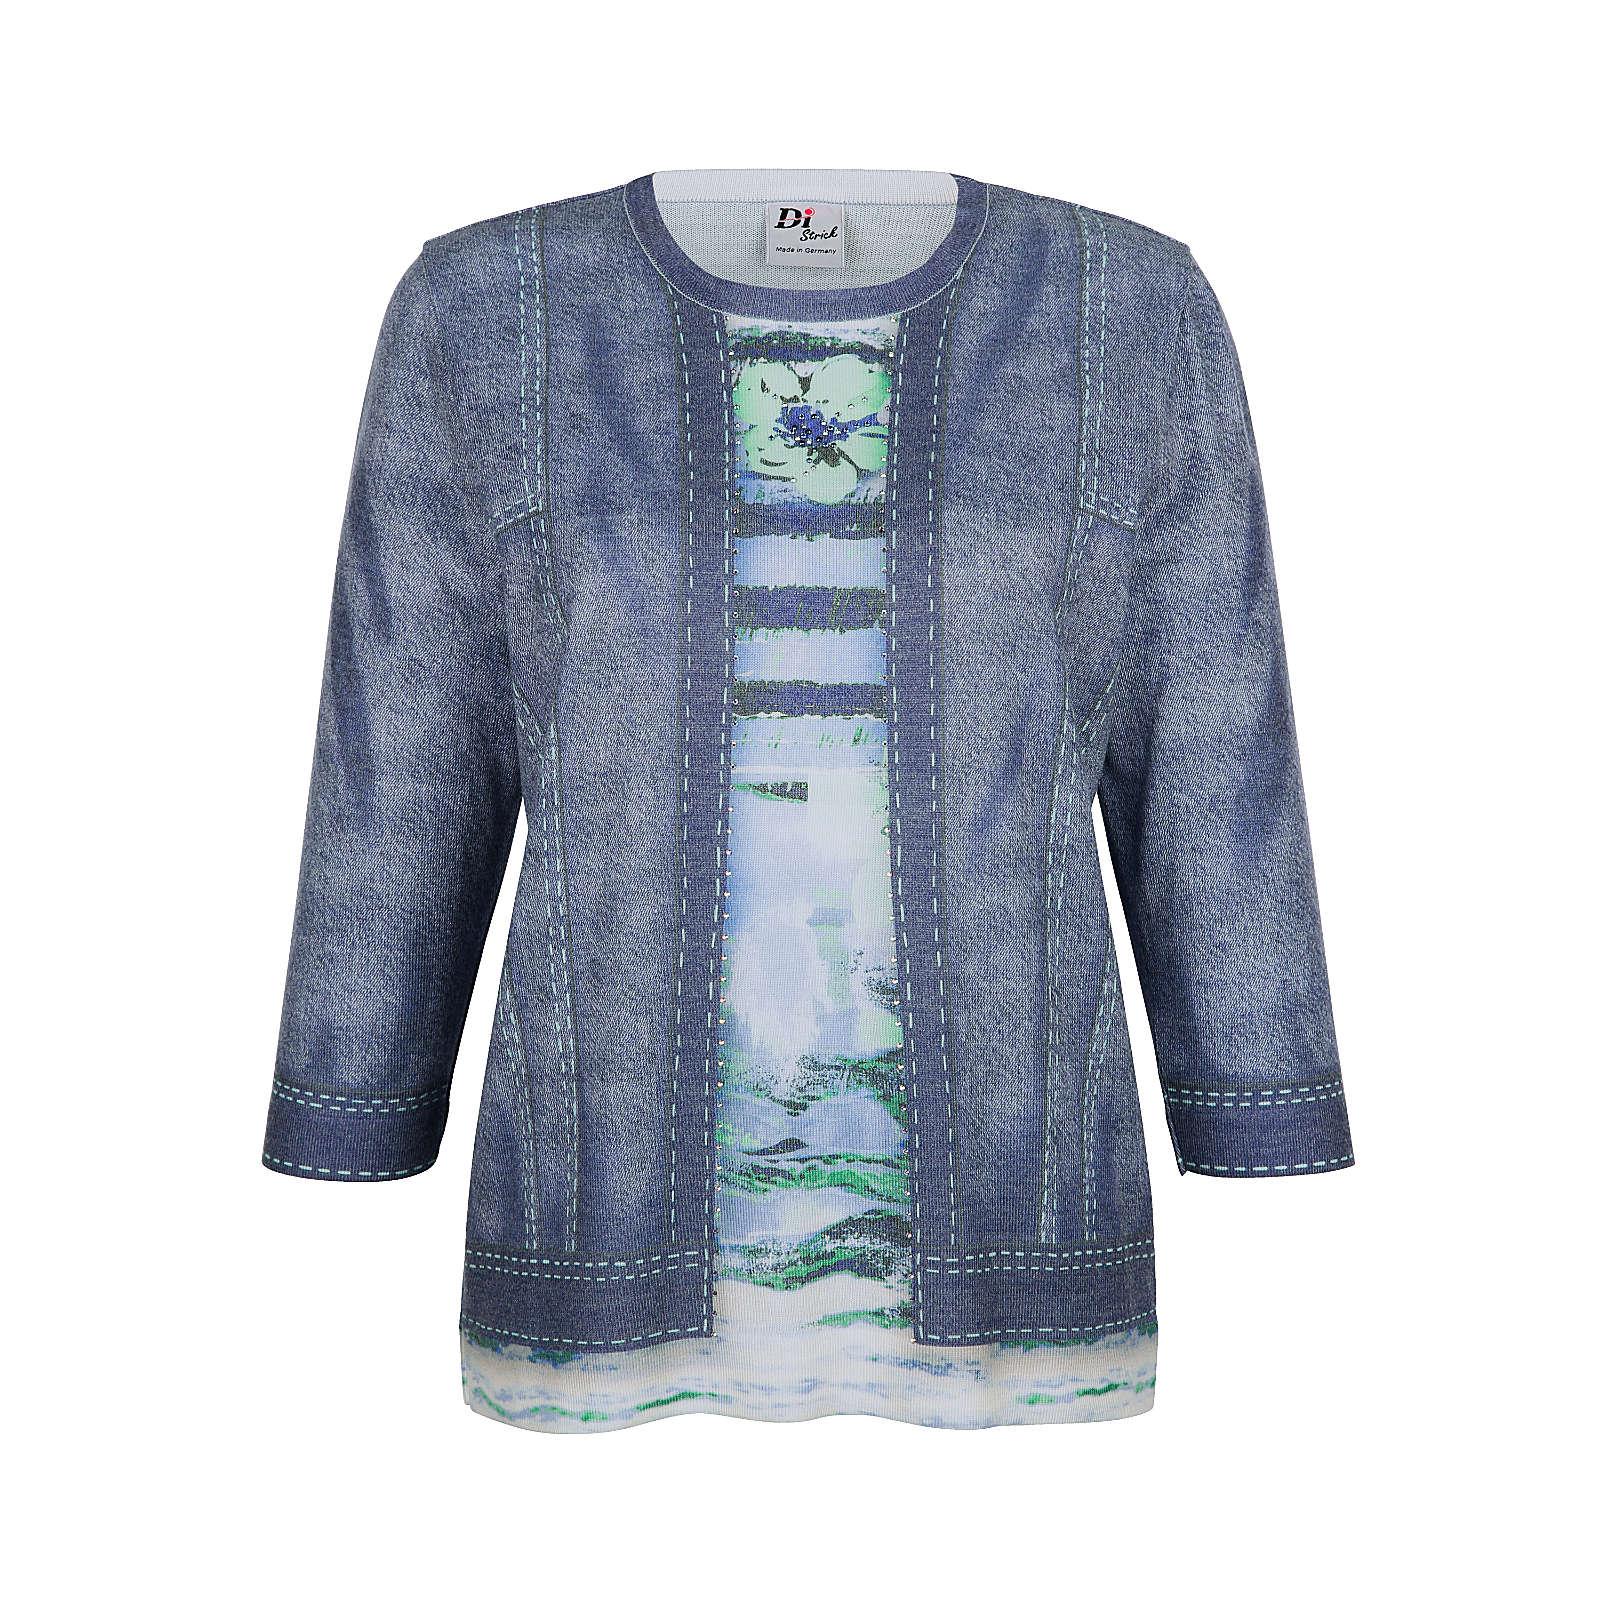 DiStrick 2in1-Pullover mehrfarbig Damen Gr. 38